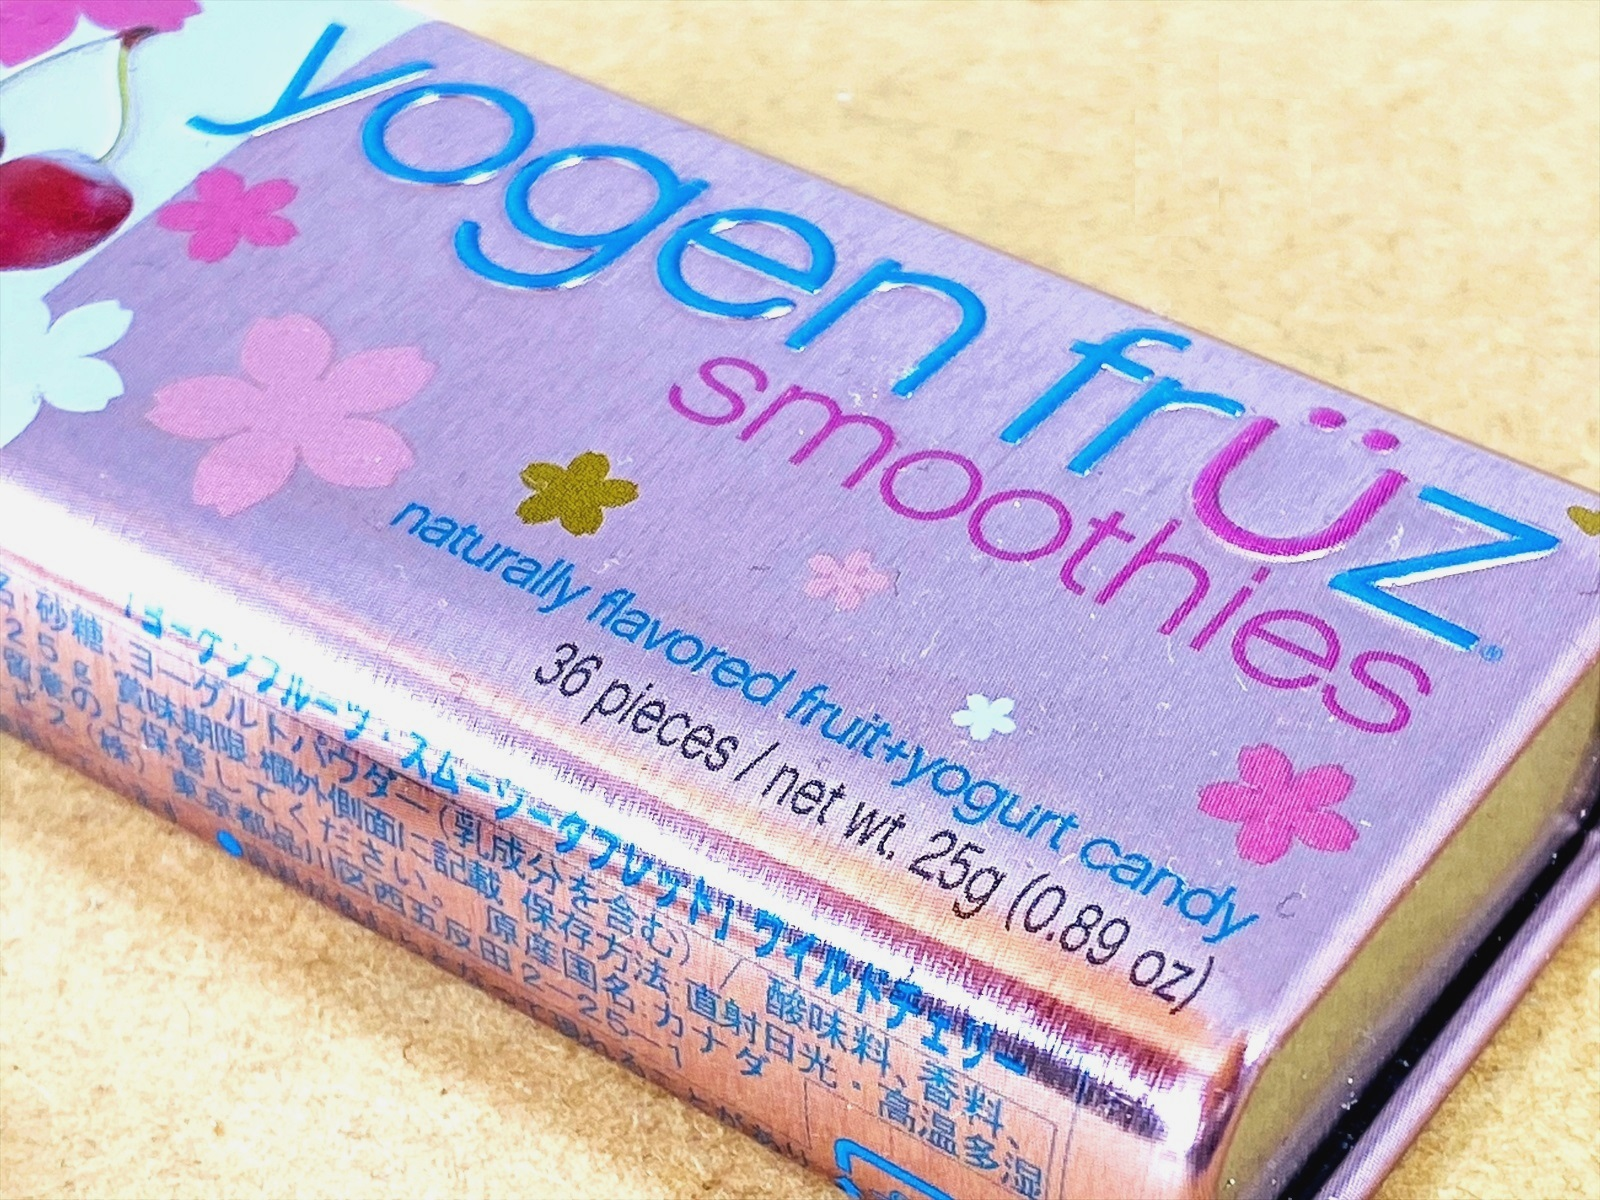 Naturally Flavored Fruit + Yogurt Cand. ナチュラルフレーバーフルーツ + ヨーグルトキャンディー。